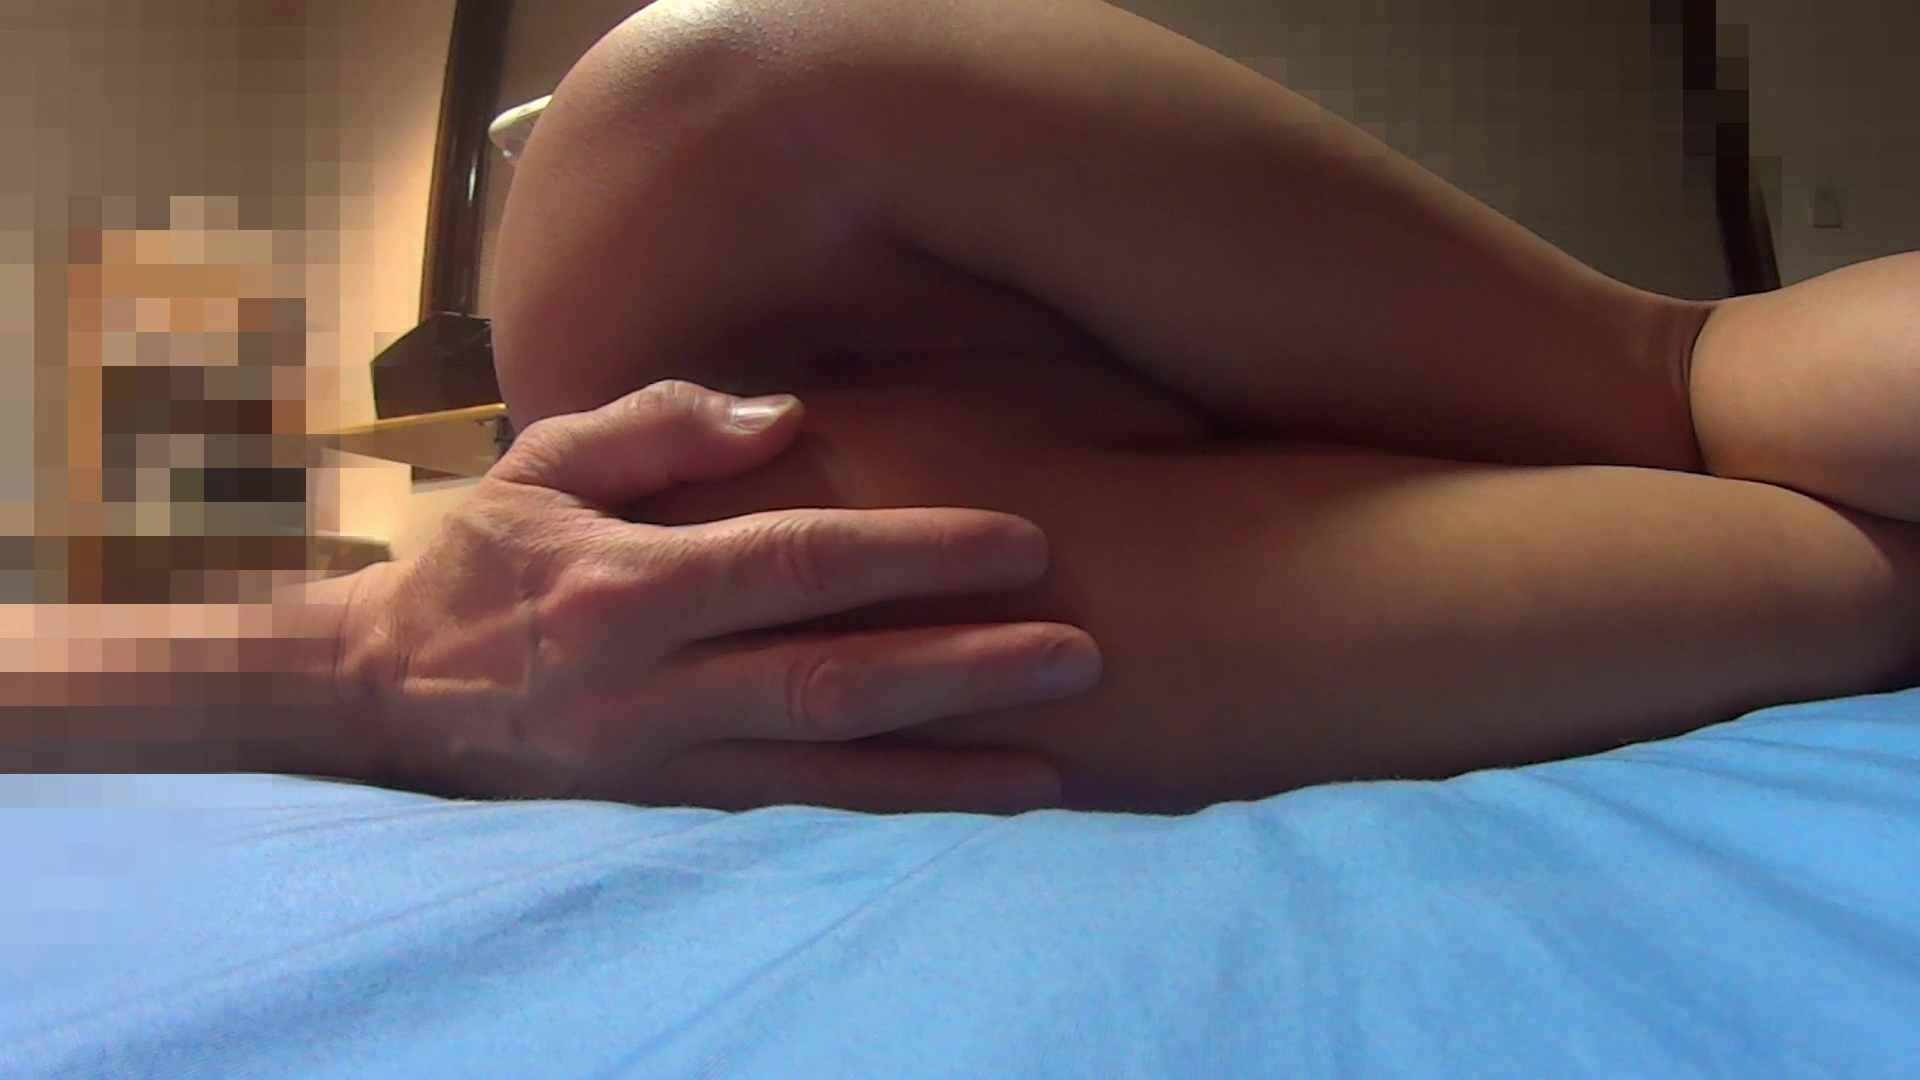 【HD】理性<欲求 Vol.02 嫁の姉 美しいOLの裸体  84pic 36